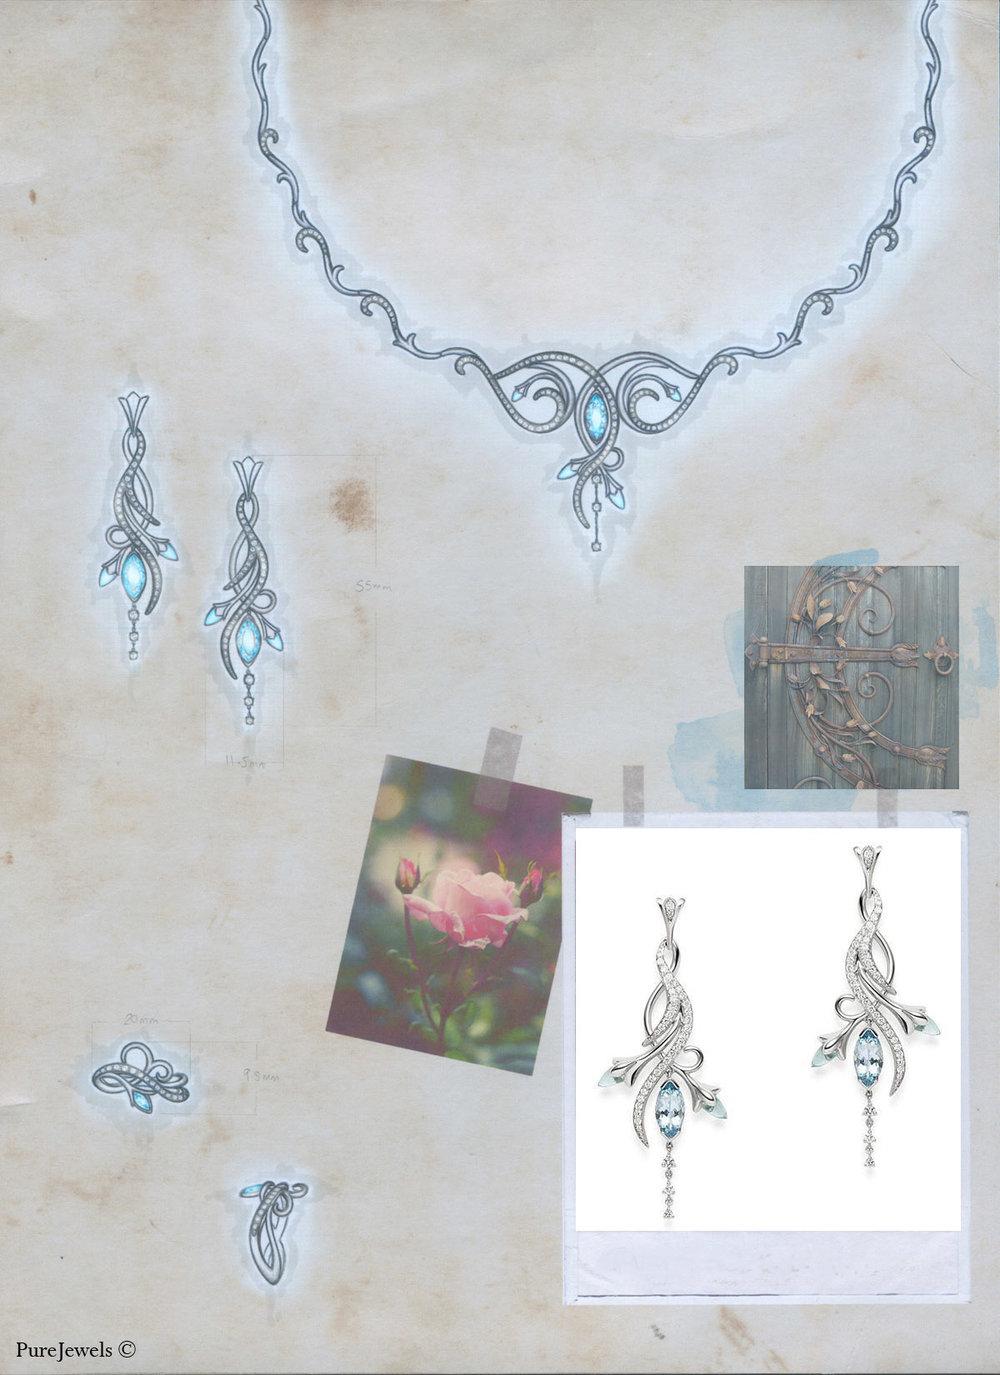 Floralia Collection: White gold, aquamarines & diamonds. Pencil illustration. Designed for  PureJewels